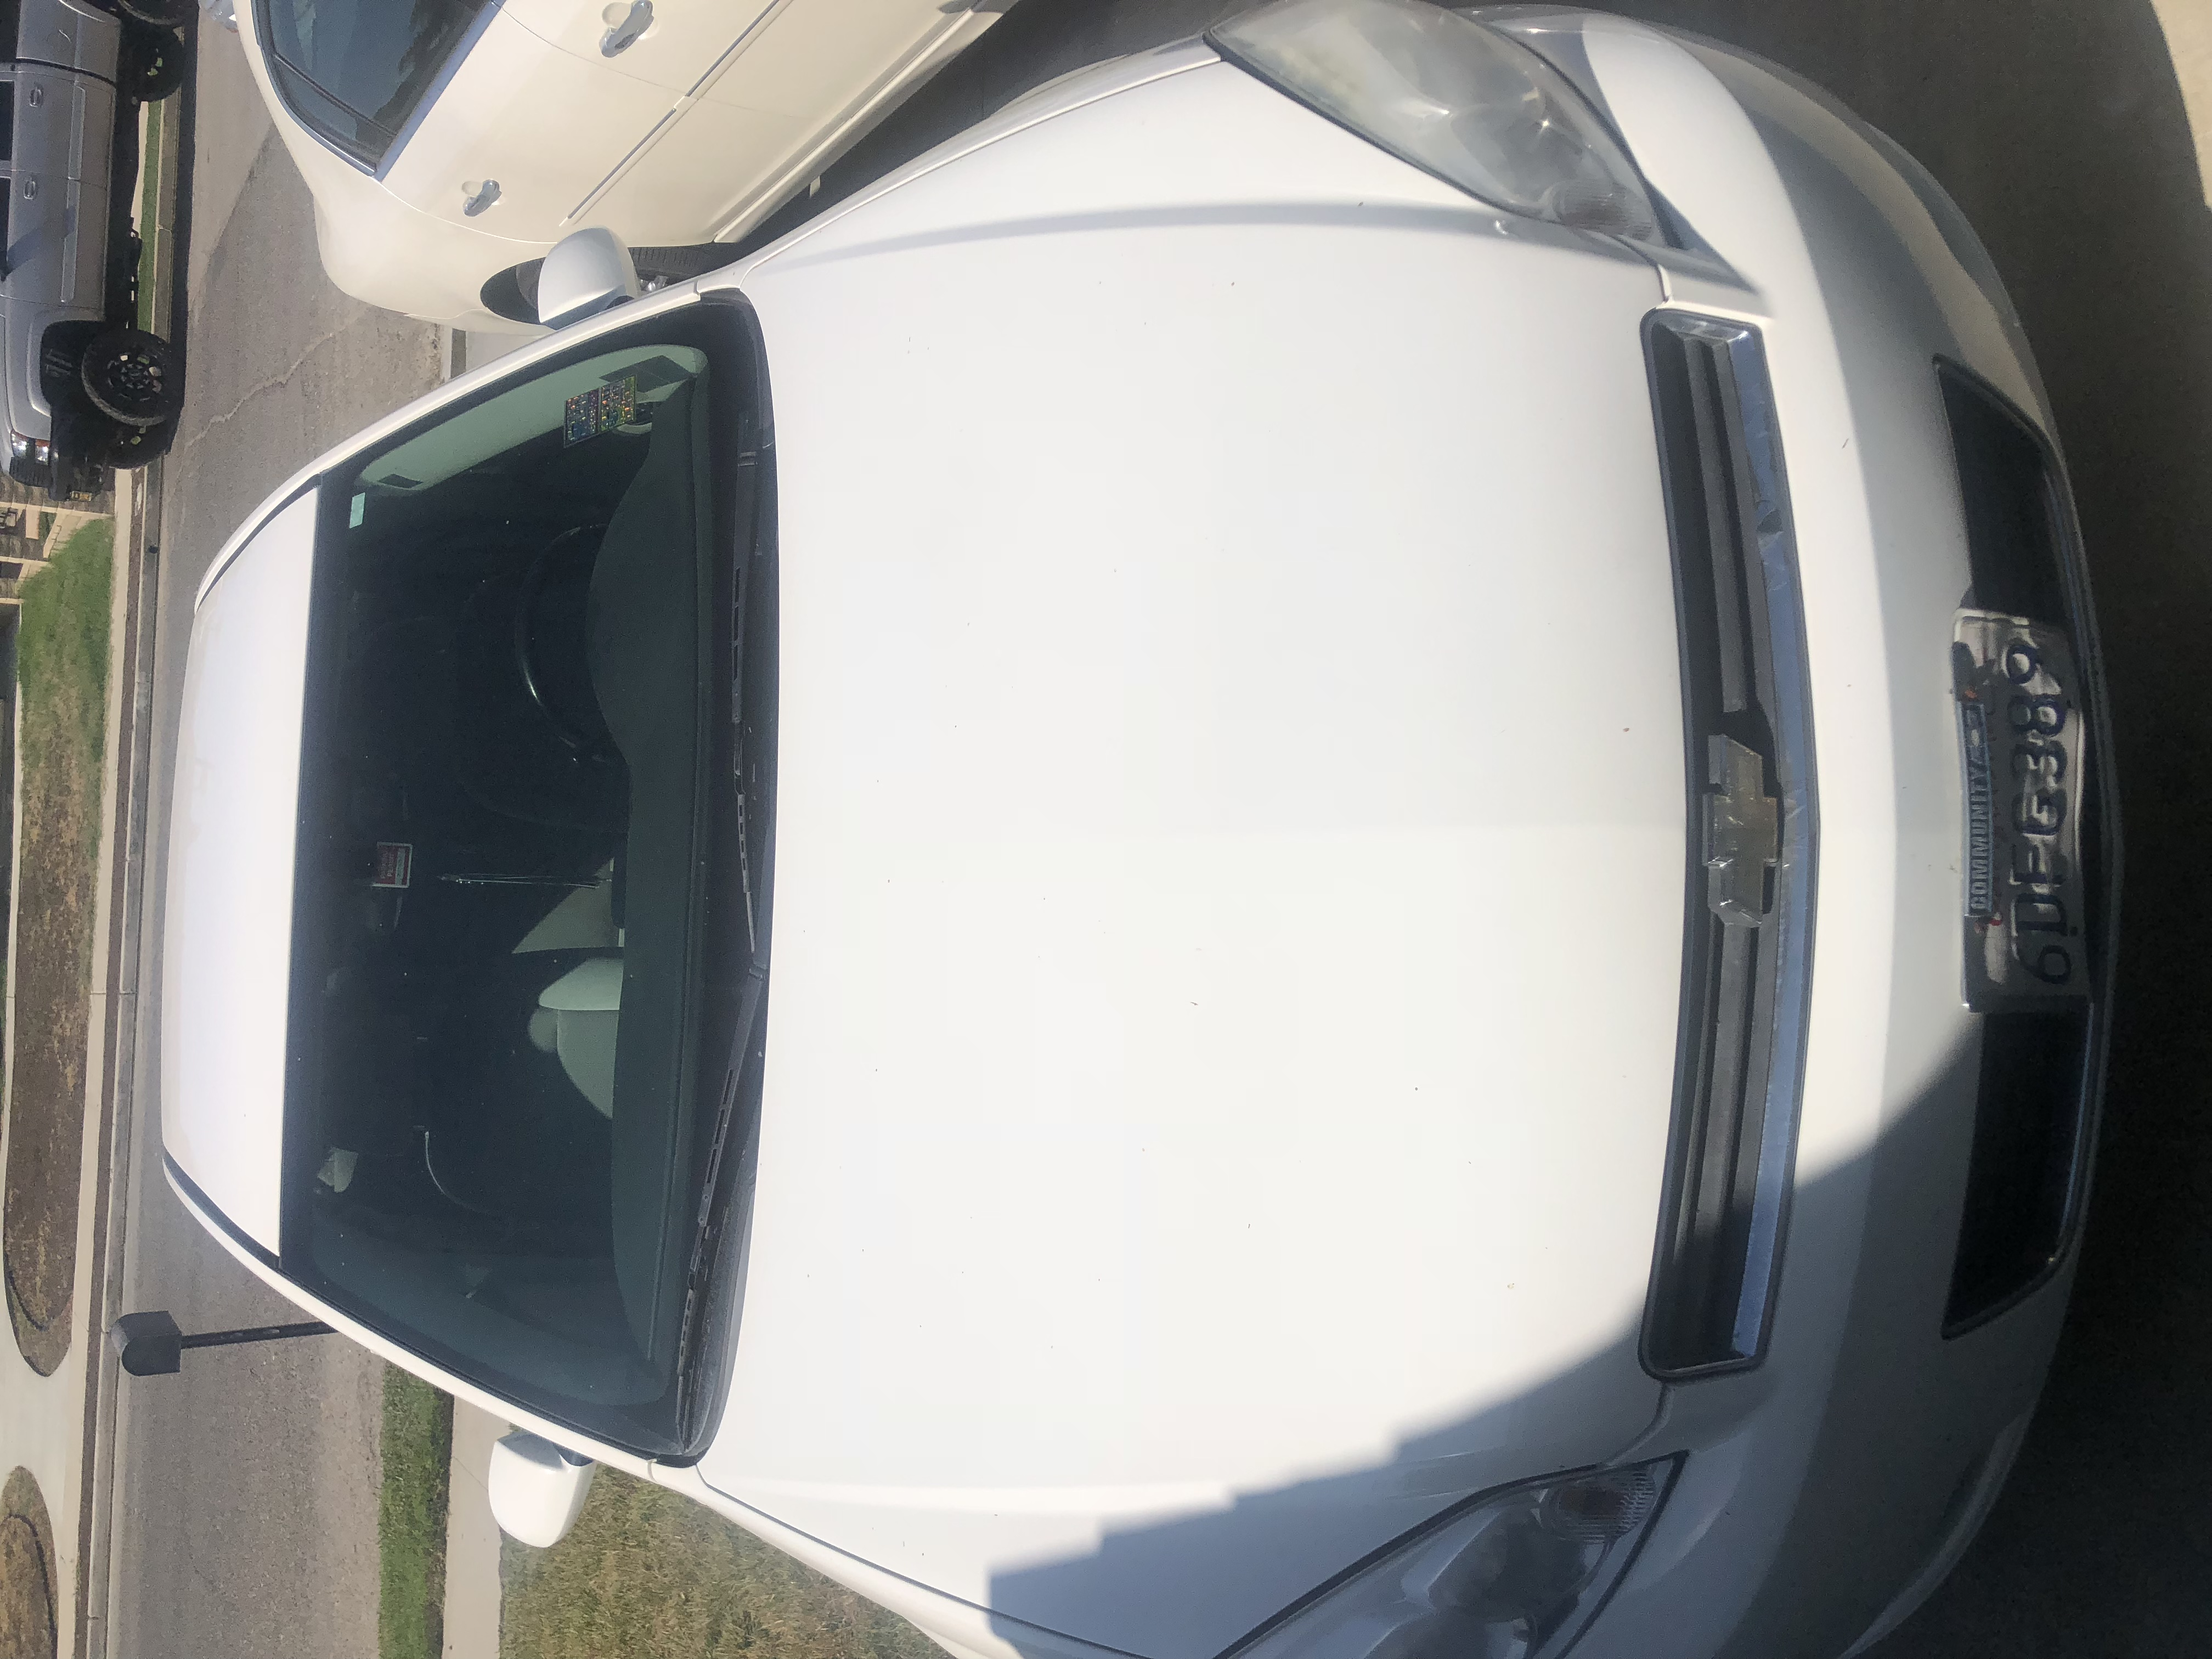 2008 White Chevy Impala